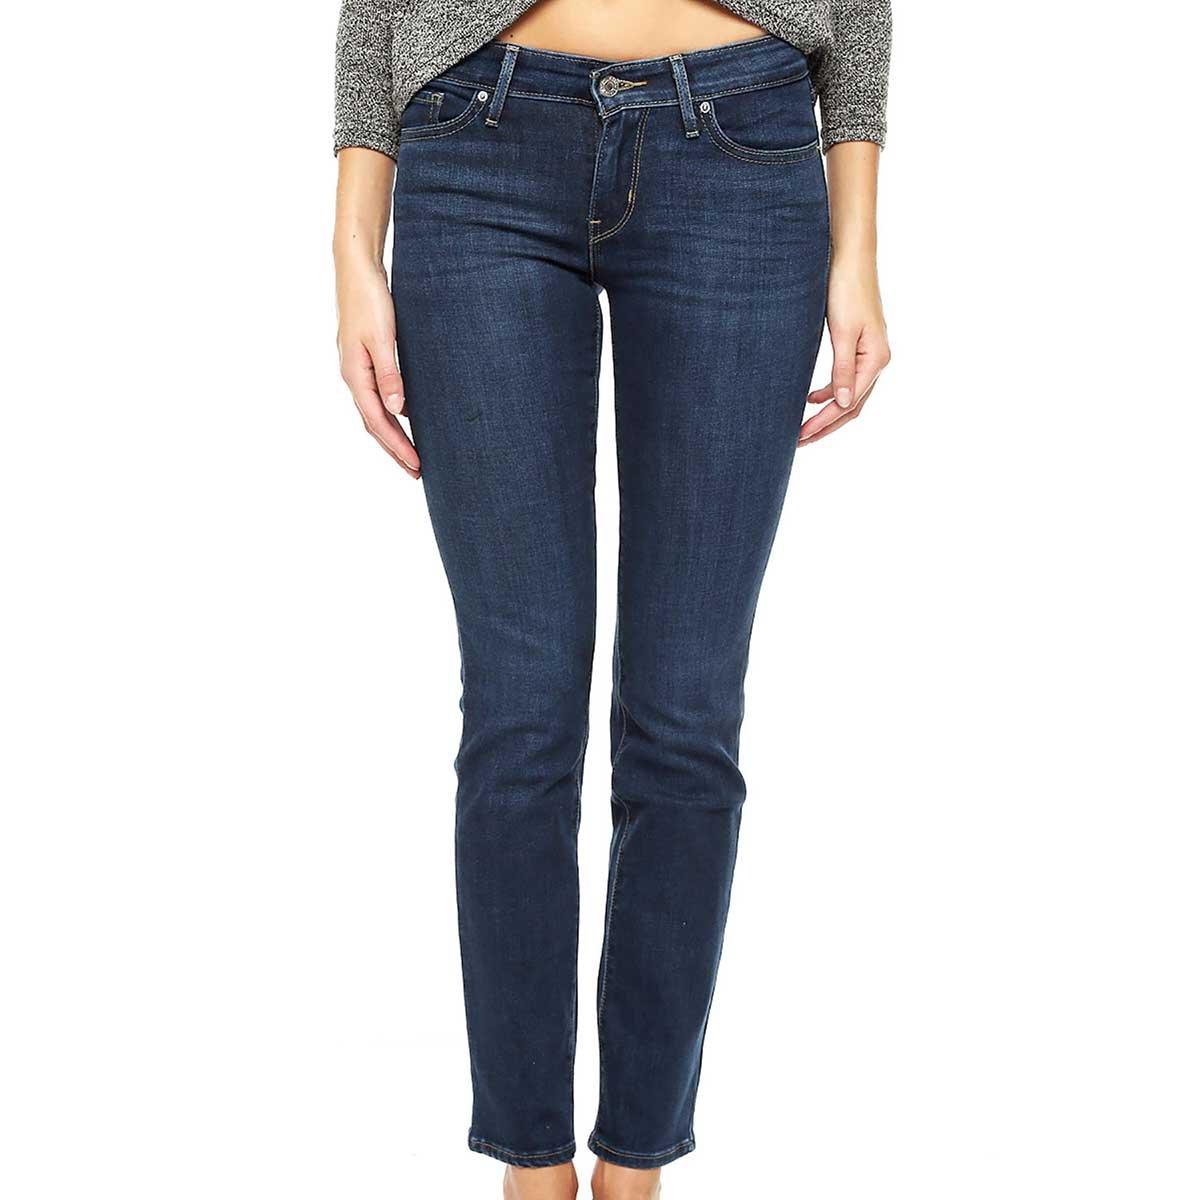 jeans levi 39 s 712 slim sears com mx me entiende. Black Bedroom Furniture Sets. Home Design Ideas